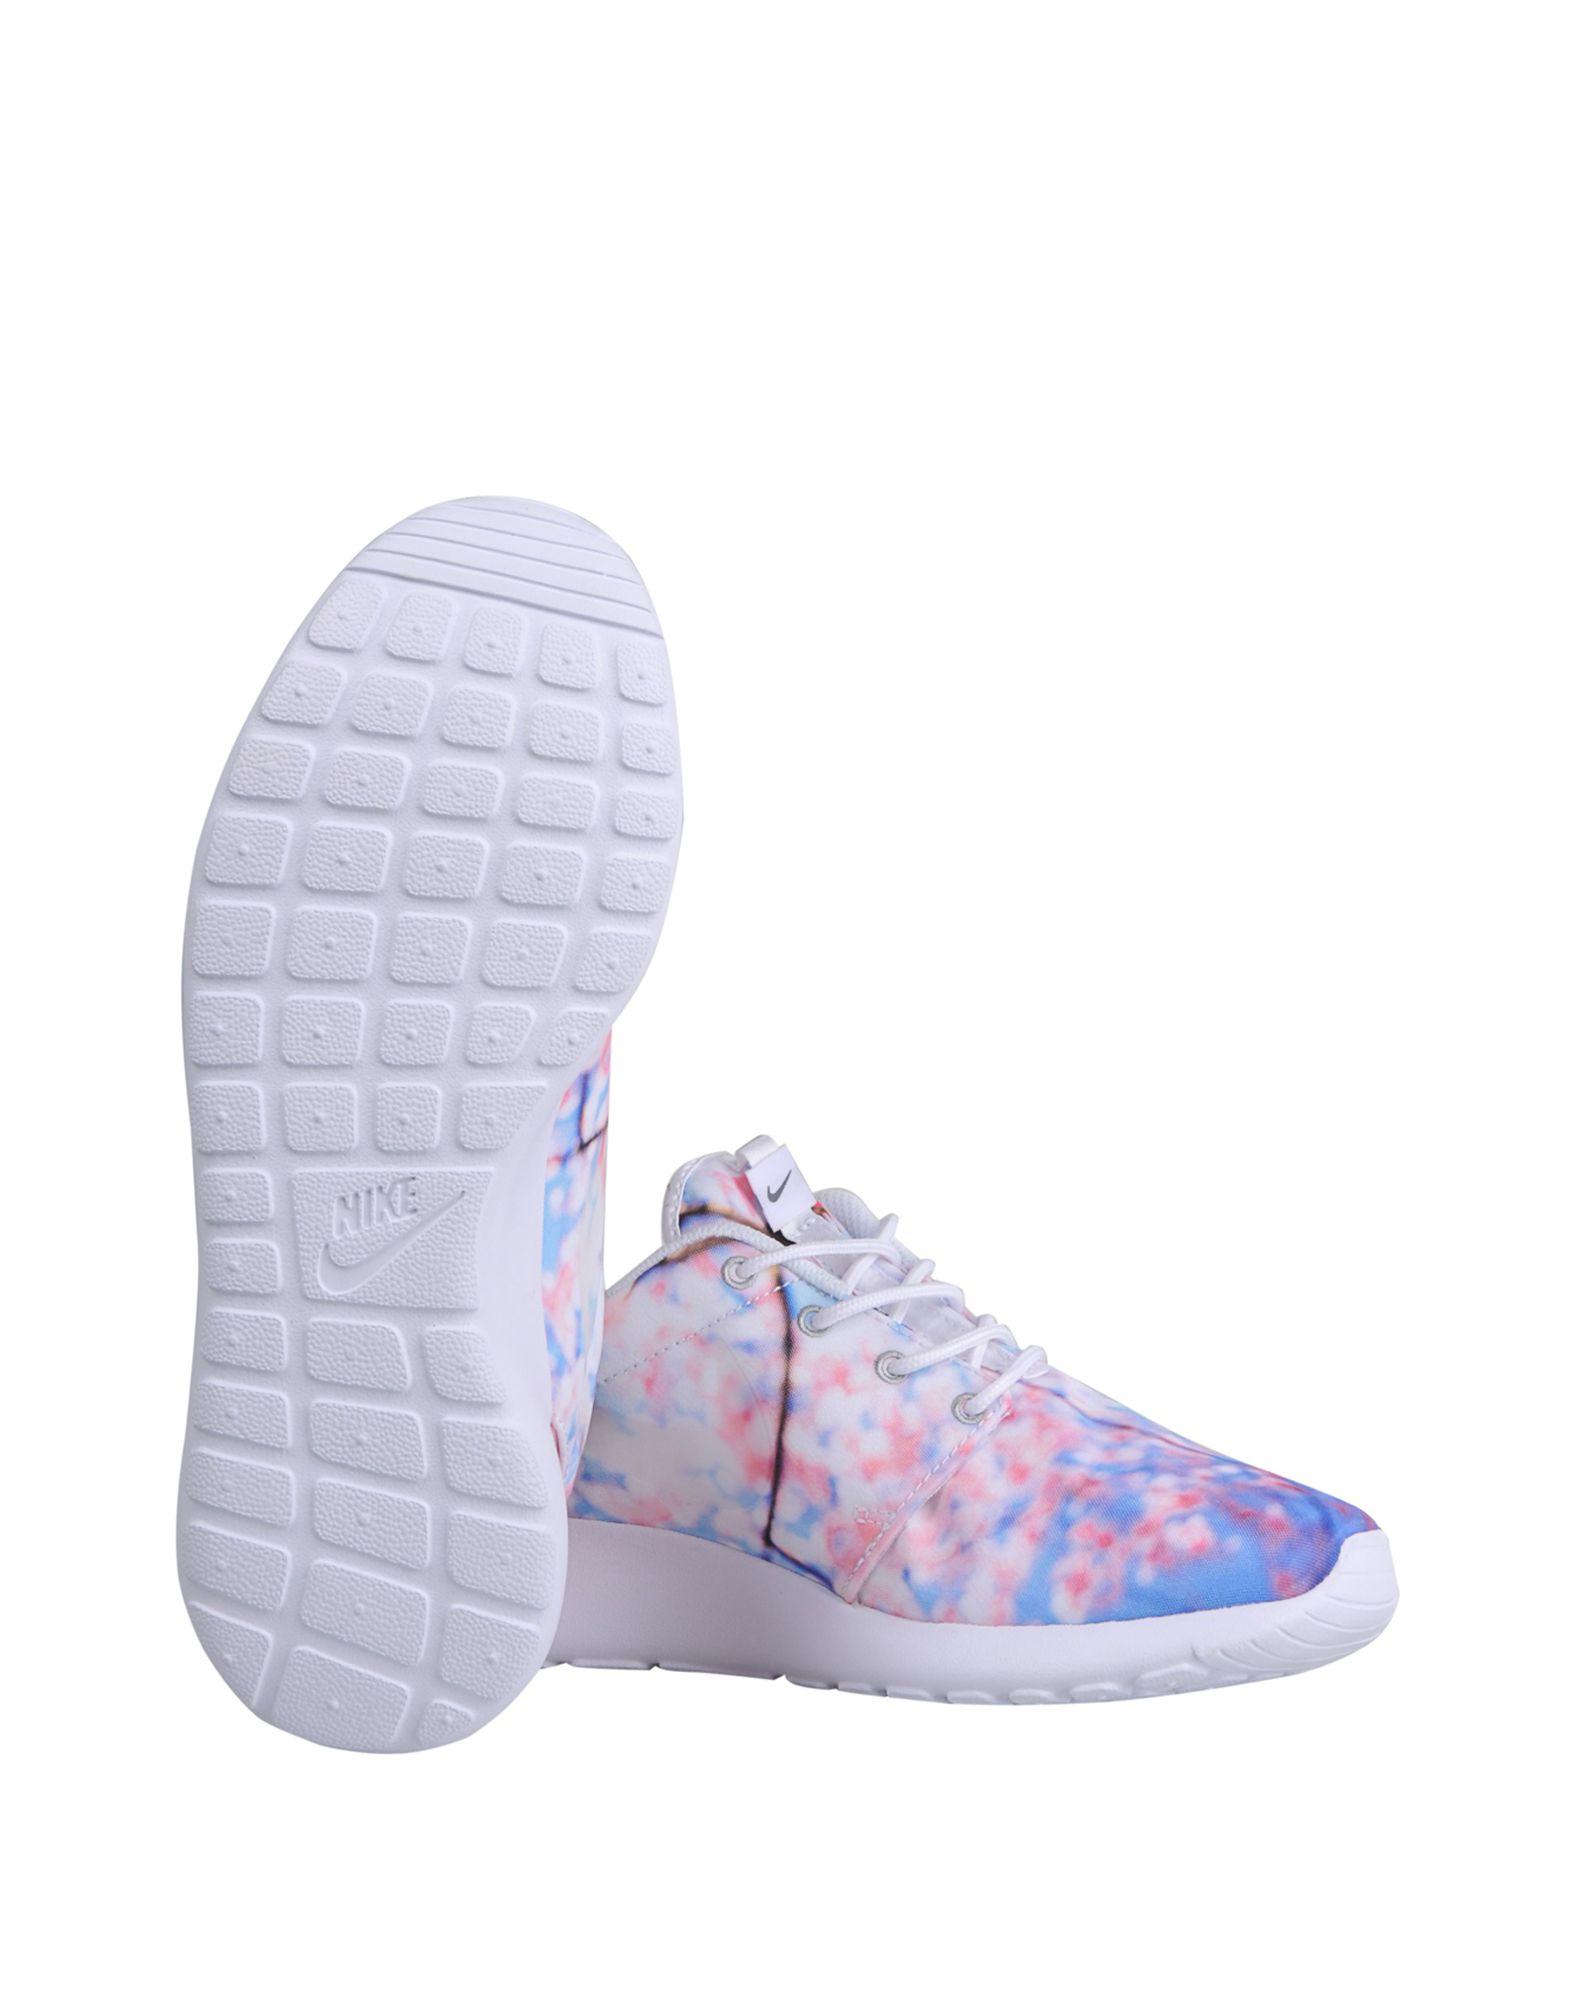 Nike Wmns Nike Roshe One Cherry Bls    11024464AH Gute Qualität beliebte Schuhe 433006